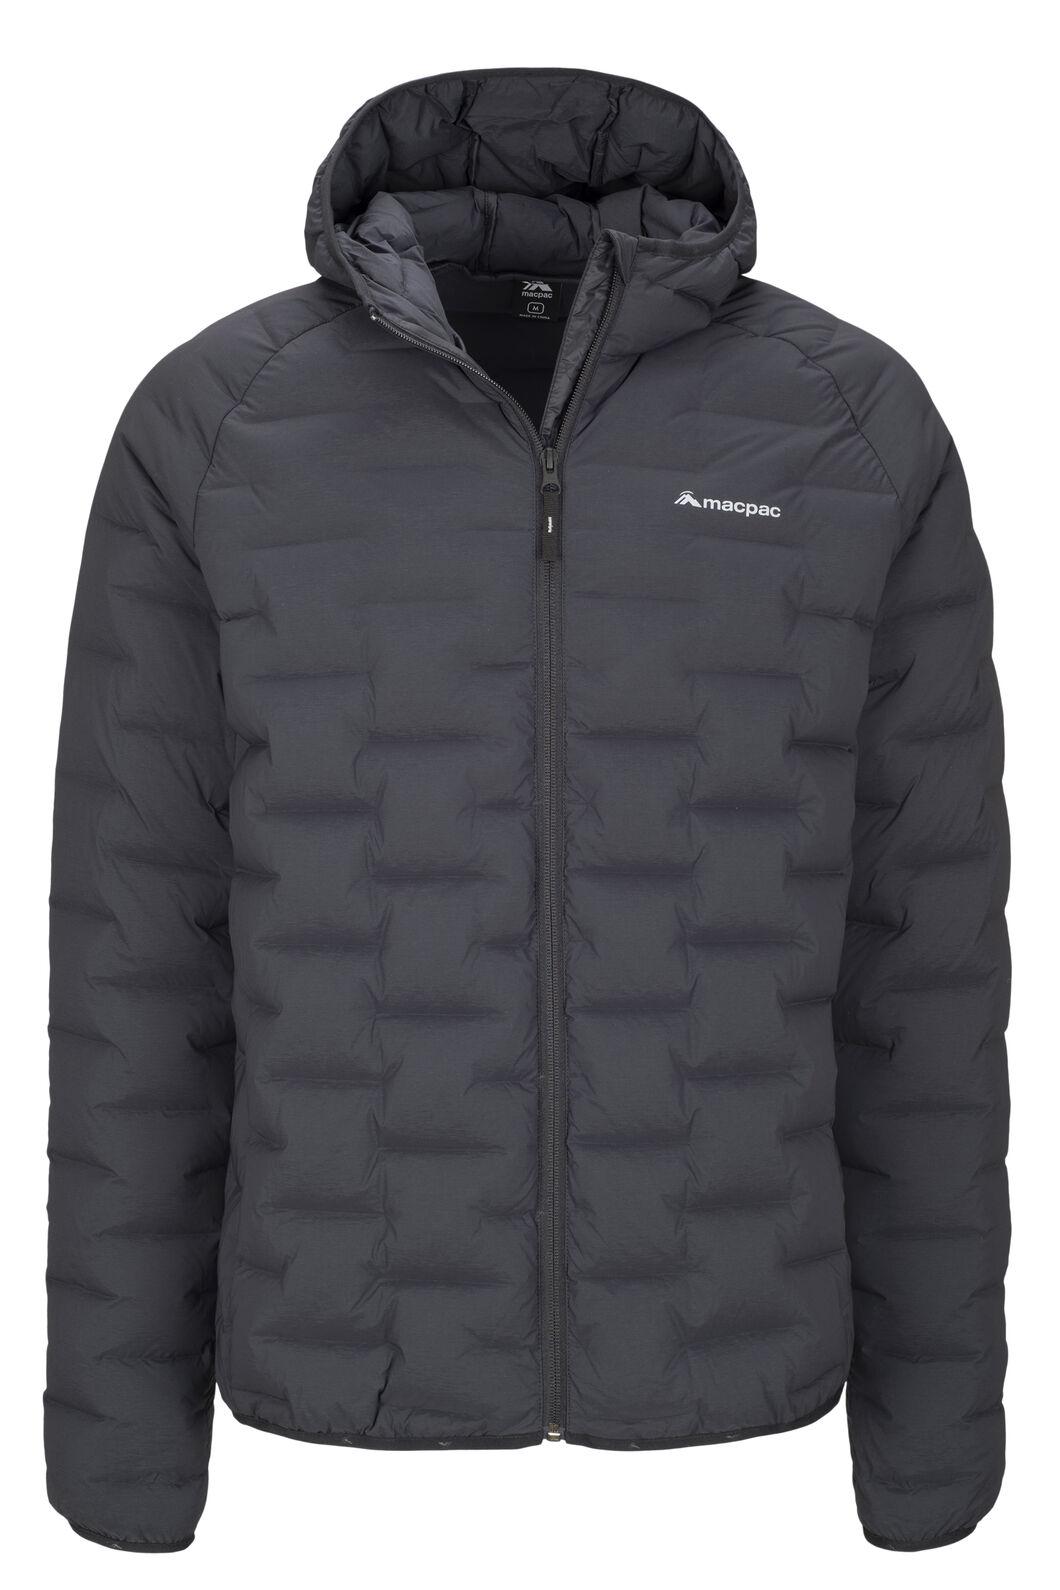 Macpac Ascend Hooded Down Jacket — Men's, Black, hi-res